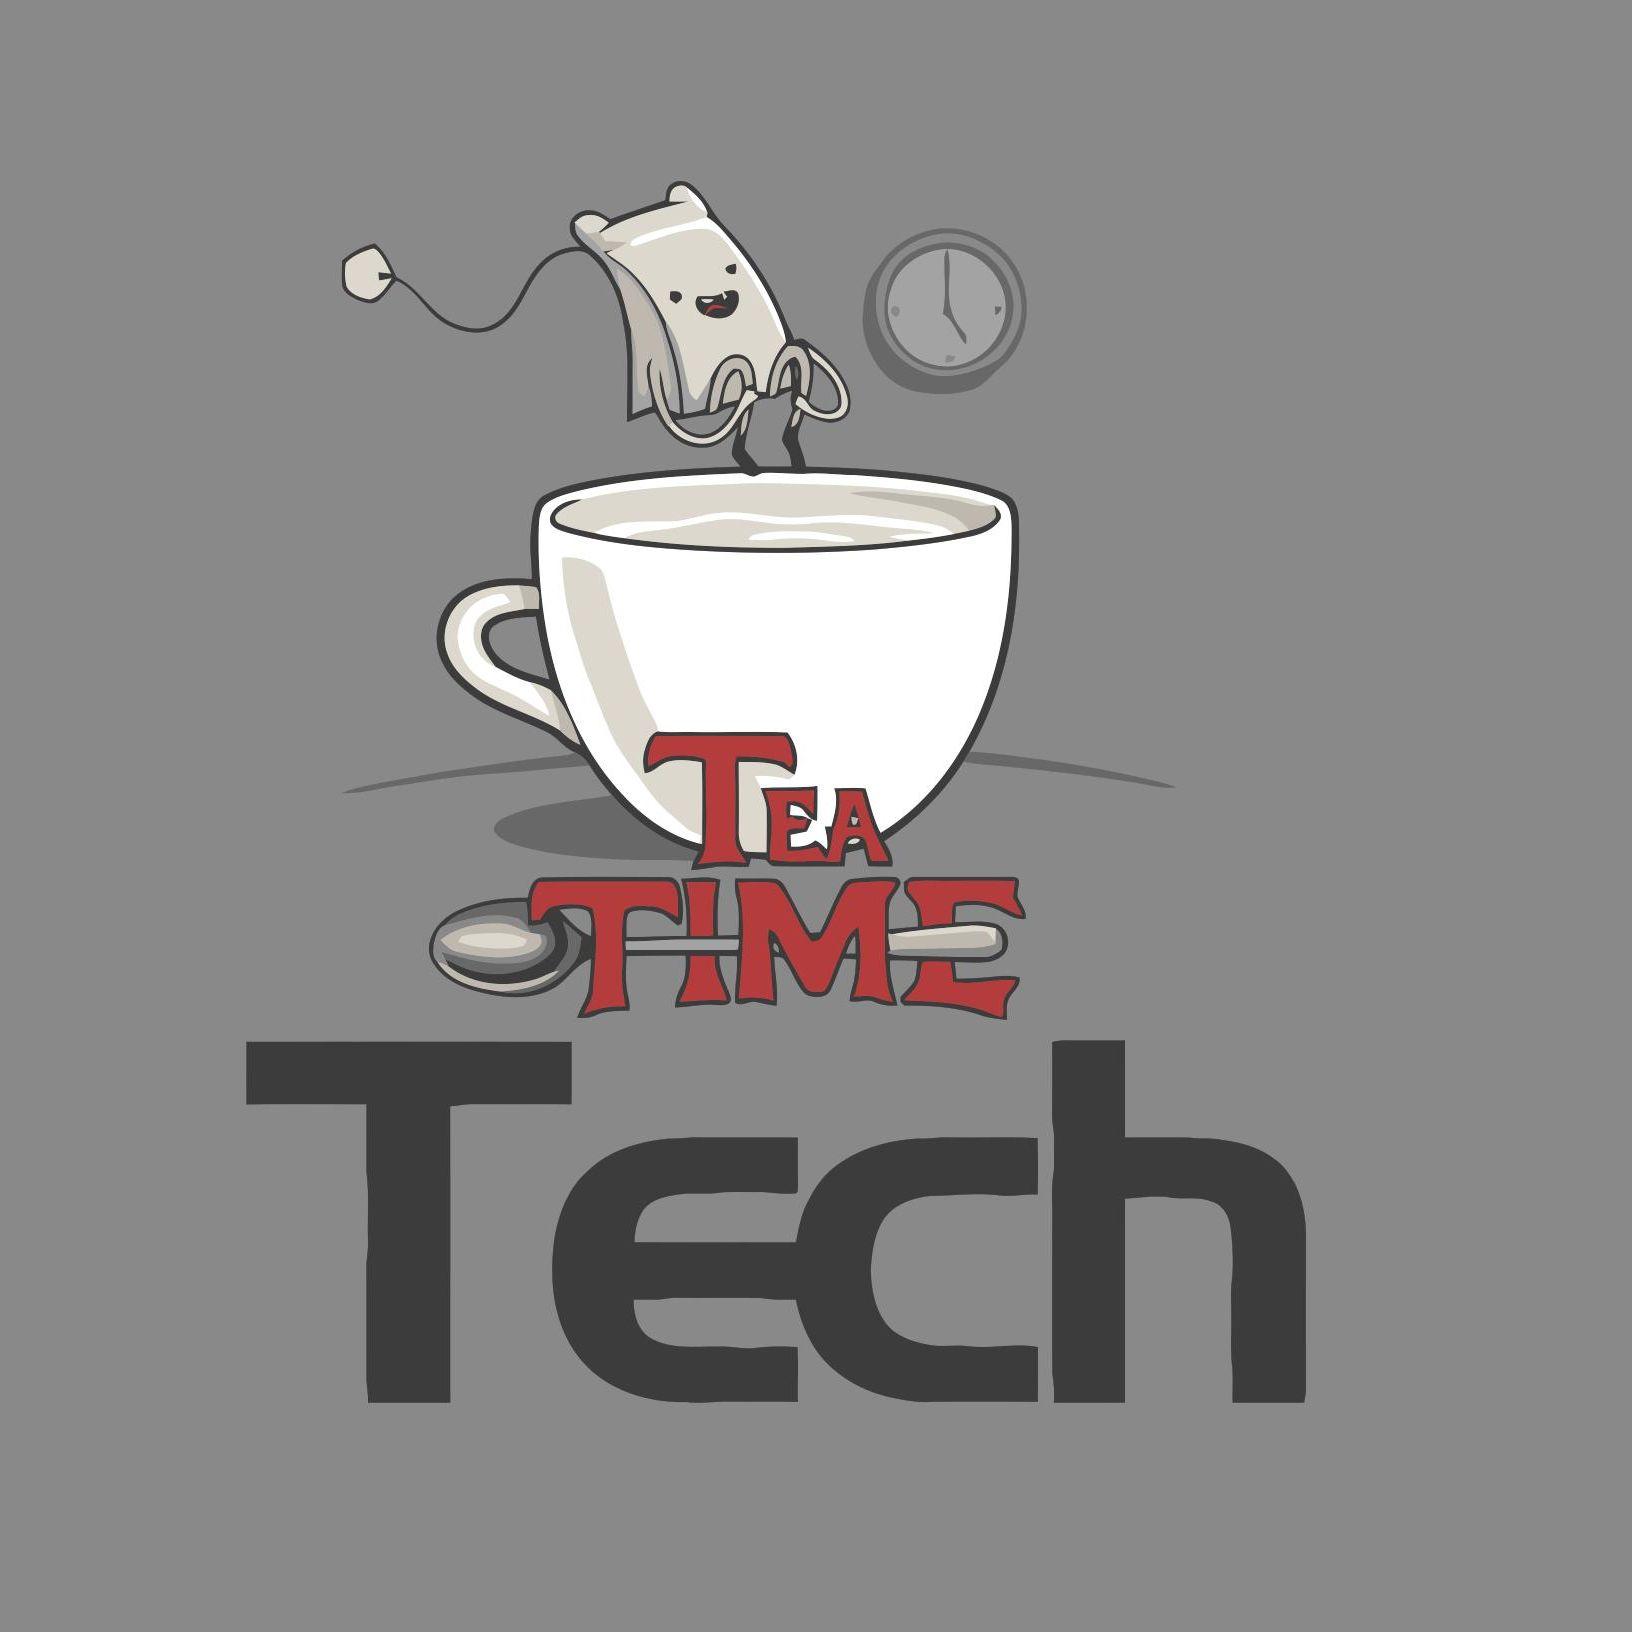 TeaTimeTech